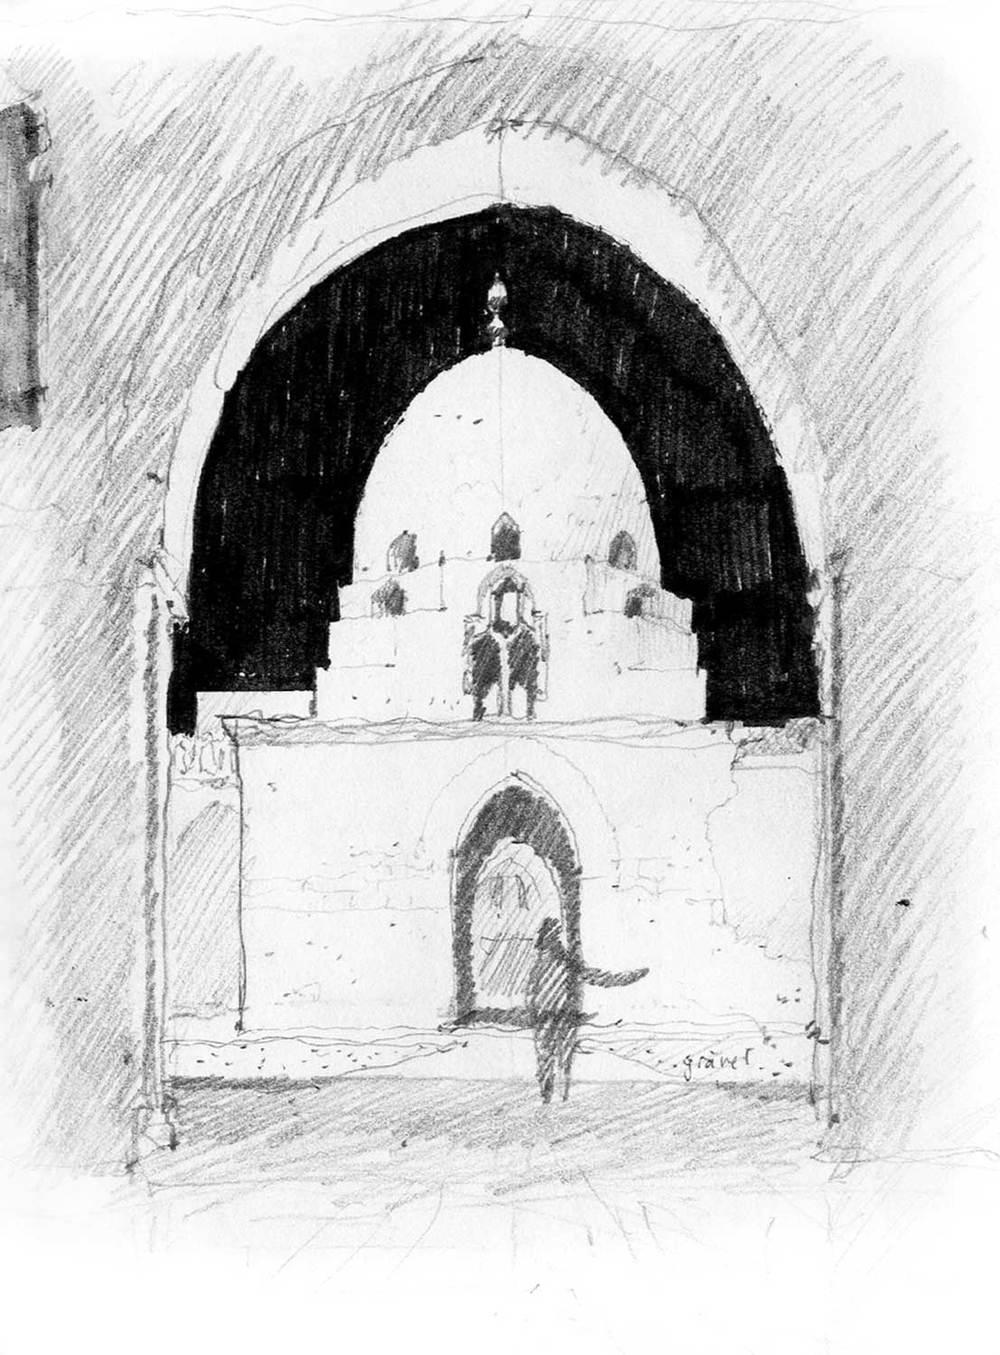 Ibn Tulun, Cairo, Egypt.  Pencil and felt-tip pen.